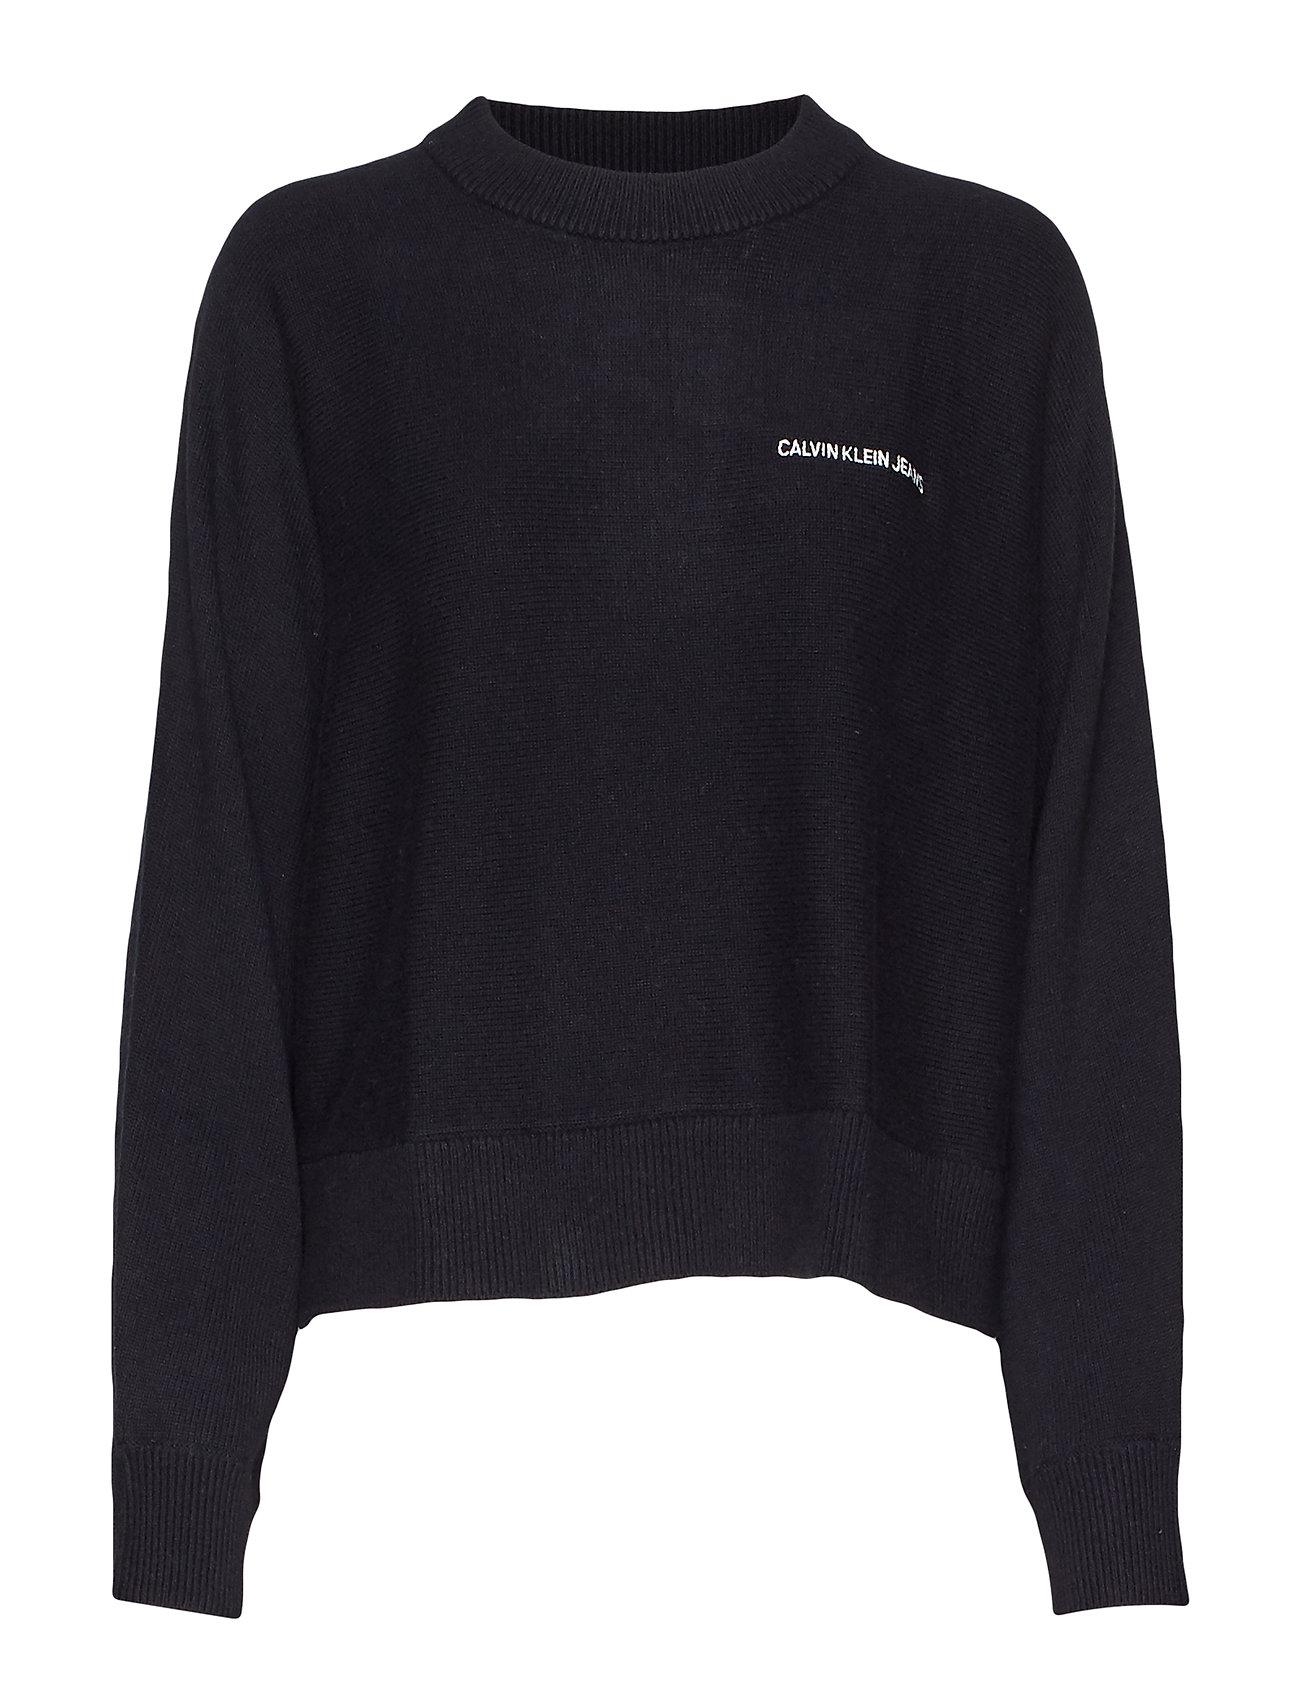 Calvin Klein Jeans CALVIN BACK LOGO SWE - CK BLACK